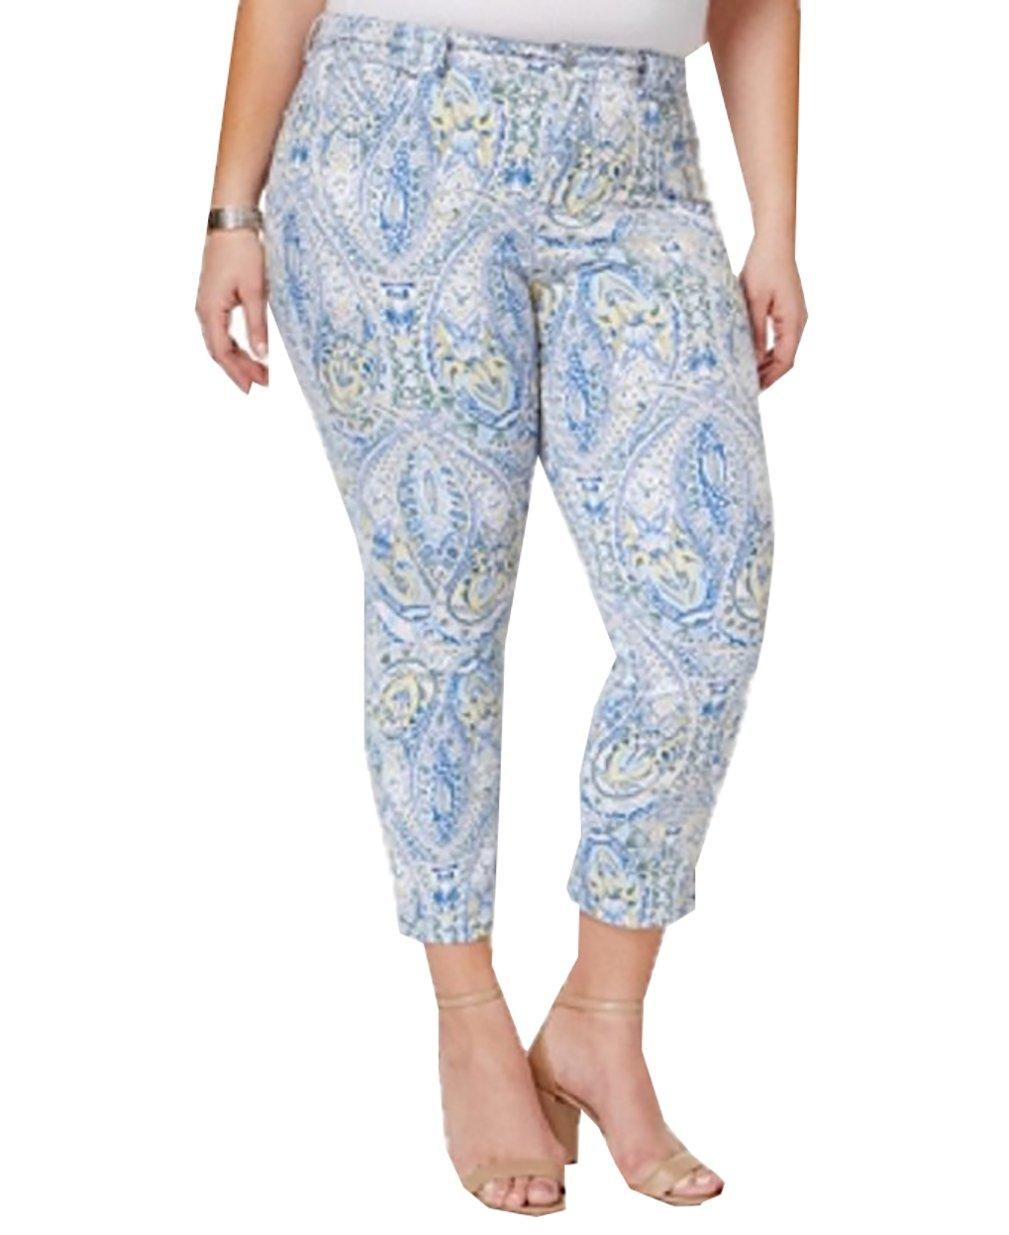 Charter Club Womens Plus Bristol Denim Printed Capri Jeans Blue 14W